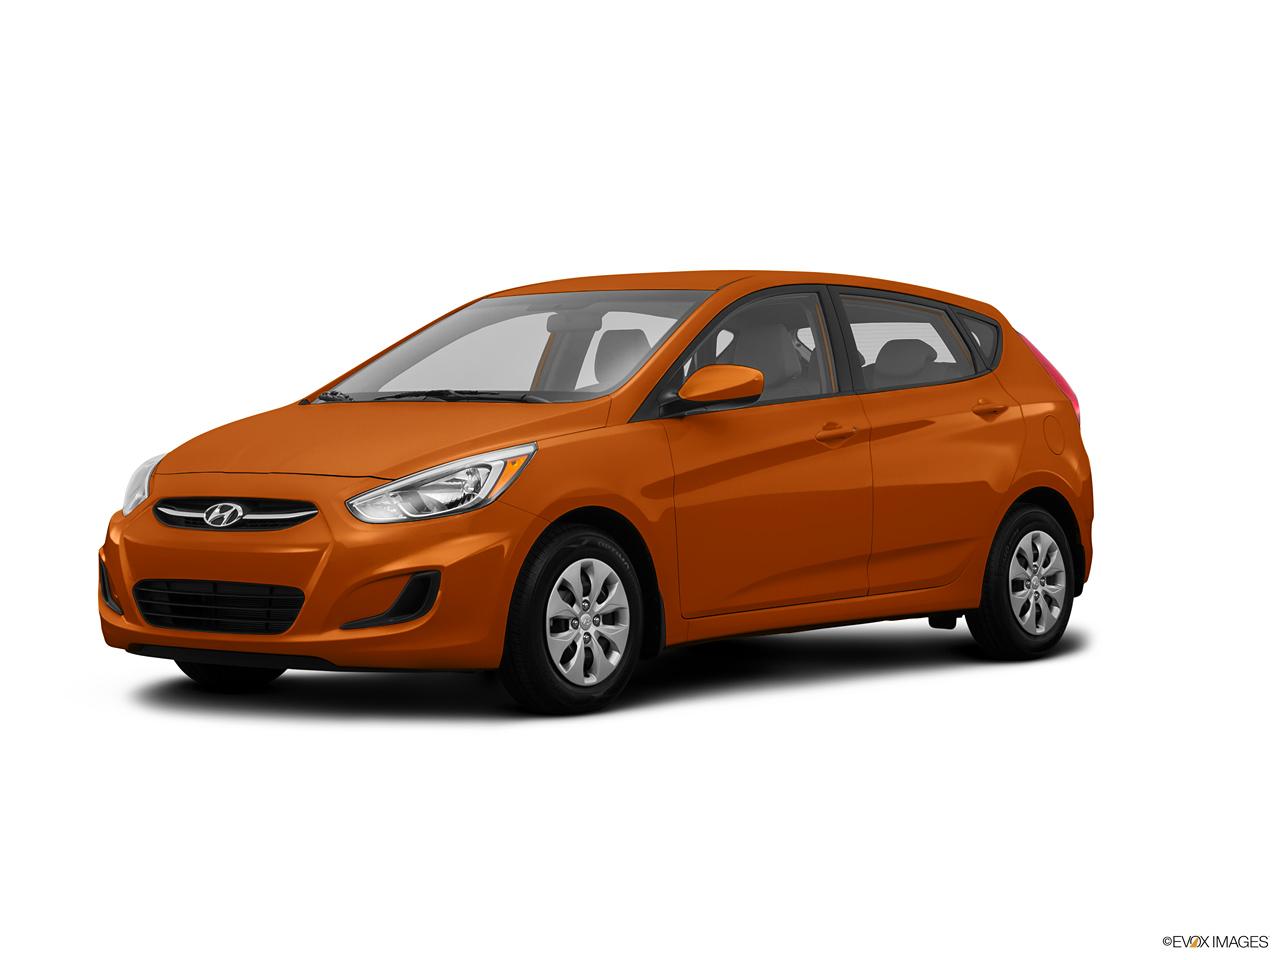 car pictures list for hyundai accent hatchback 2018 1 6l gl kuwait yallamotor. Black Bedroom Furniture Sets. Home Design Ideas